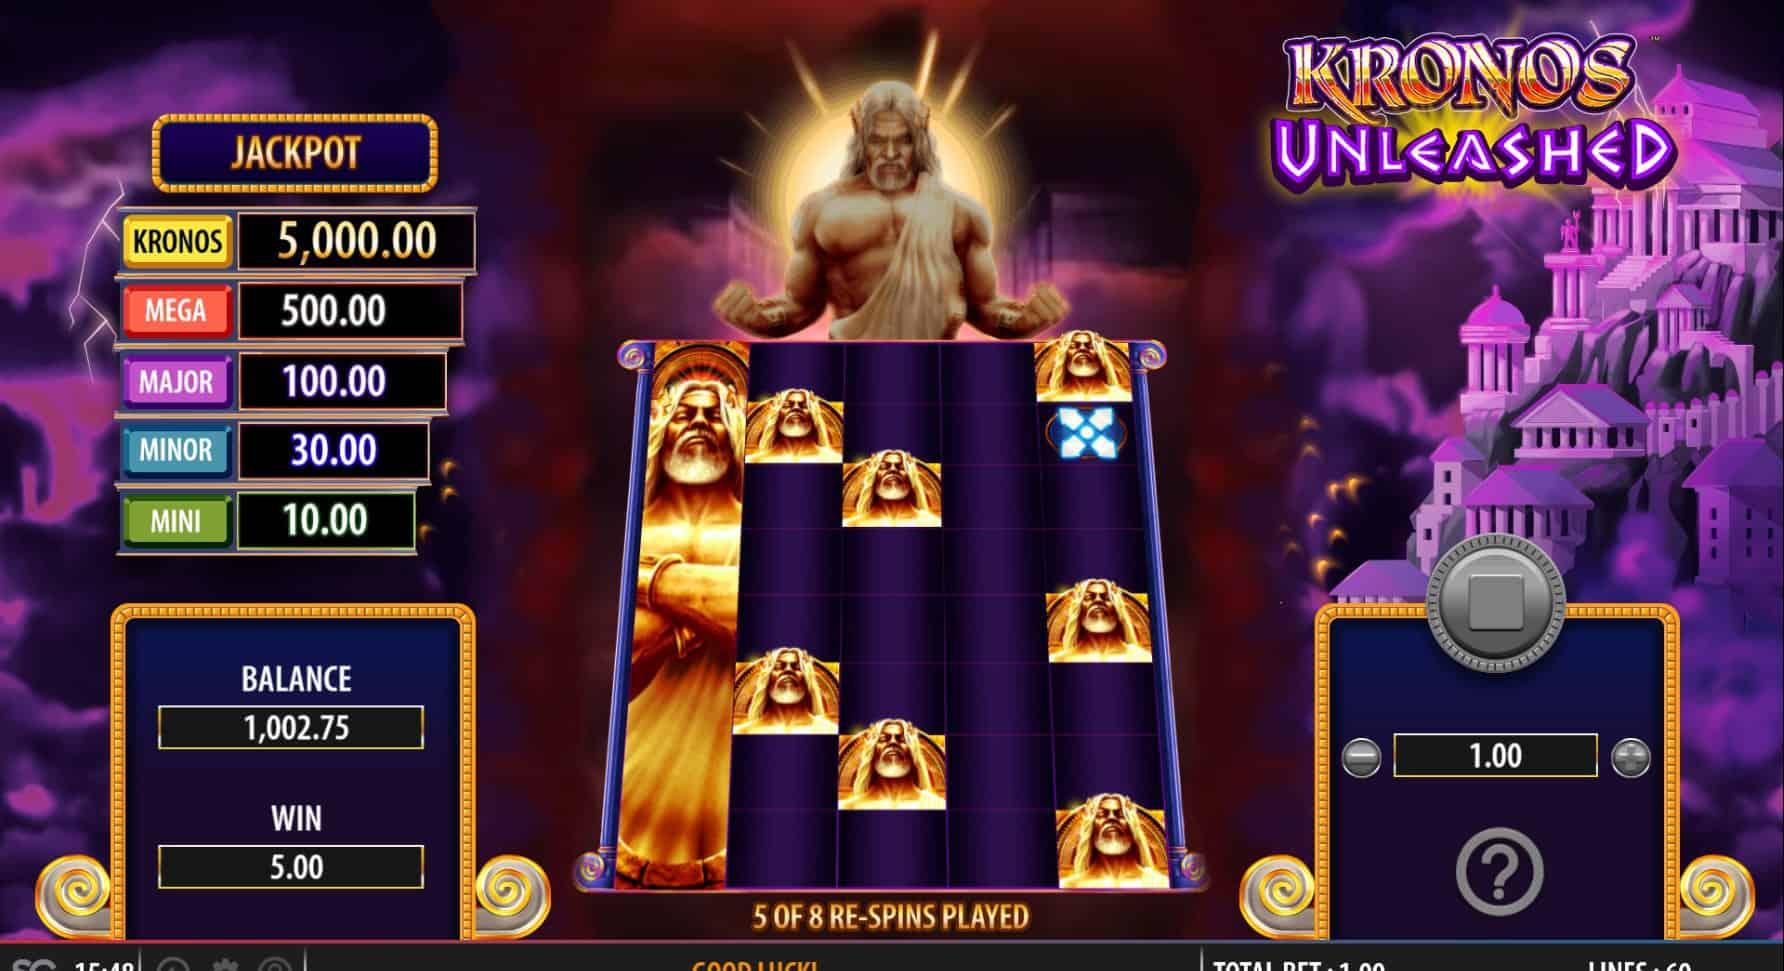 sginteractive-kronosunleashed-symbol-casinogroundsdotcom